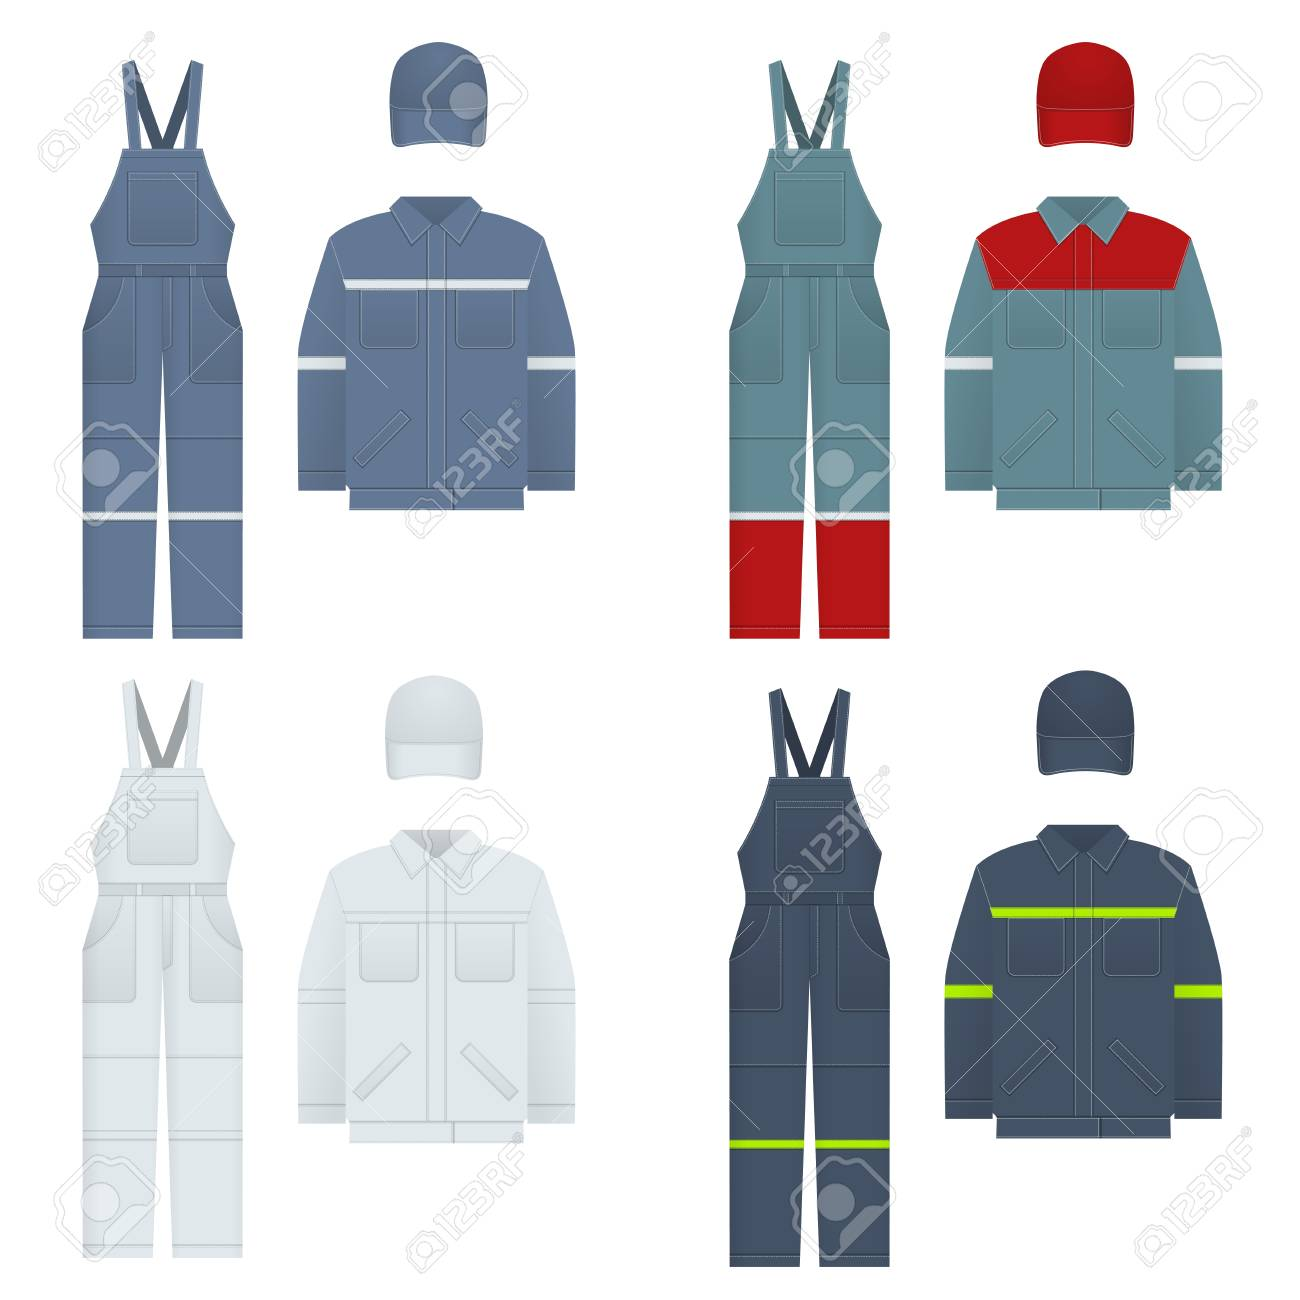 ec9c6dd92231 Vector Illustration Of Men s Overalls. Clothes In Denim Style ...